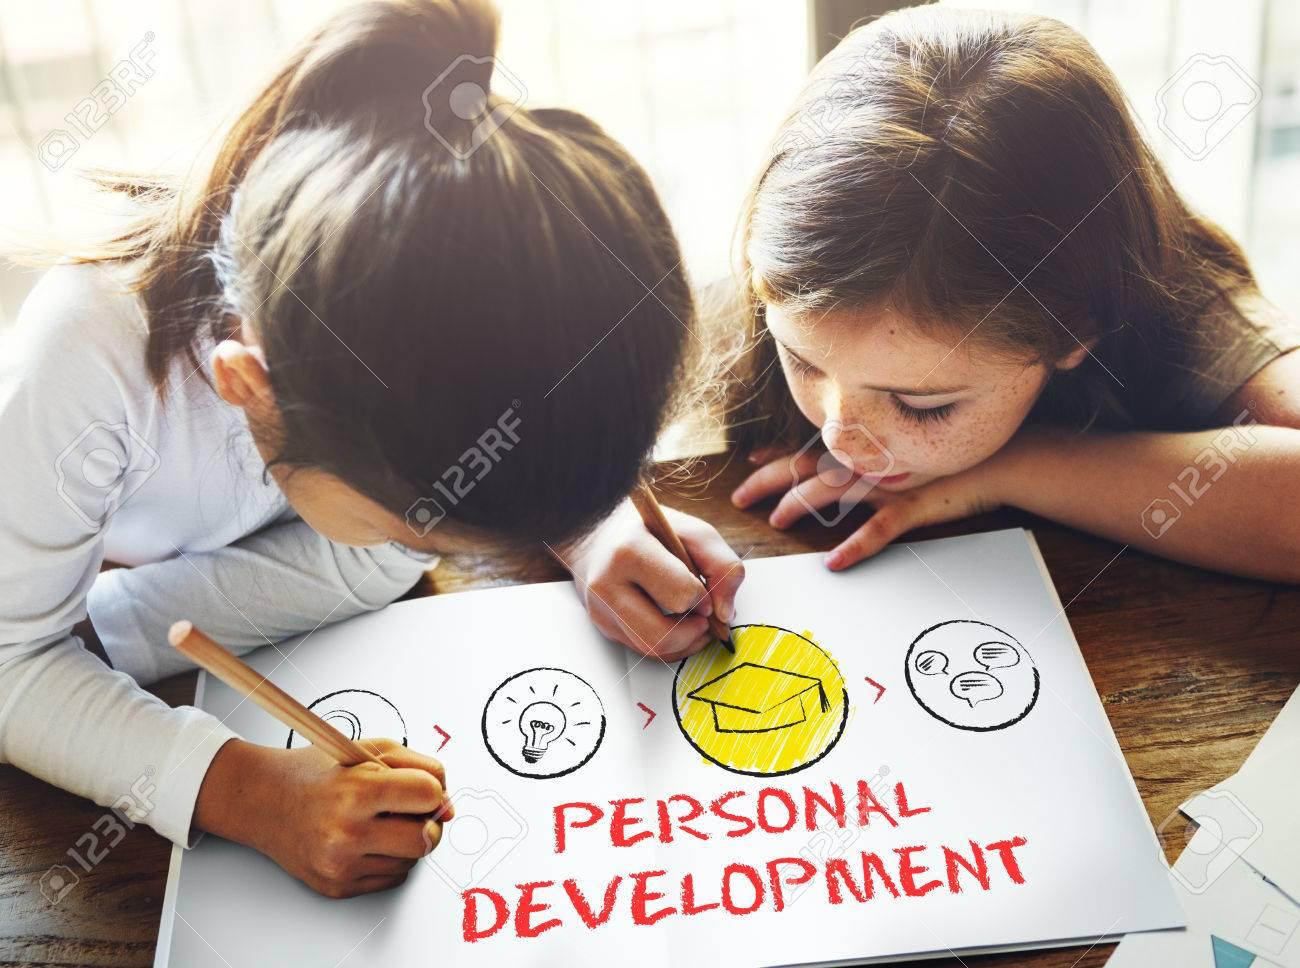 personal development improvement progress aspirations concept personal development improvement progress aspirations concept stock photo 60908111